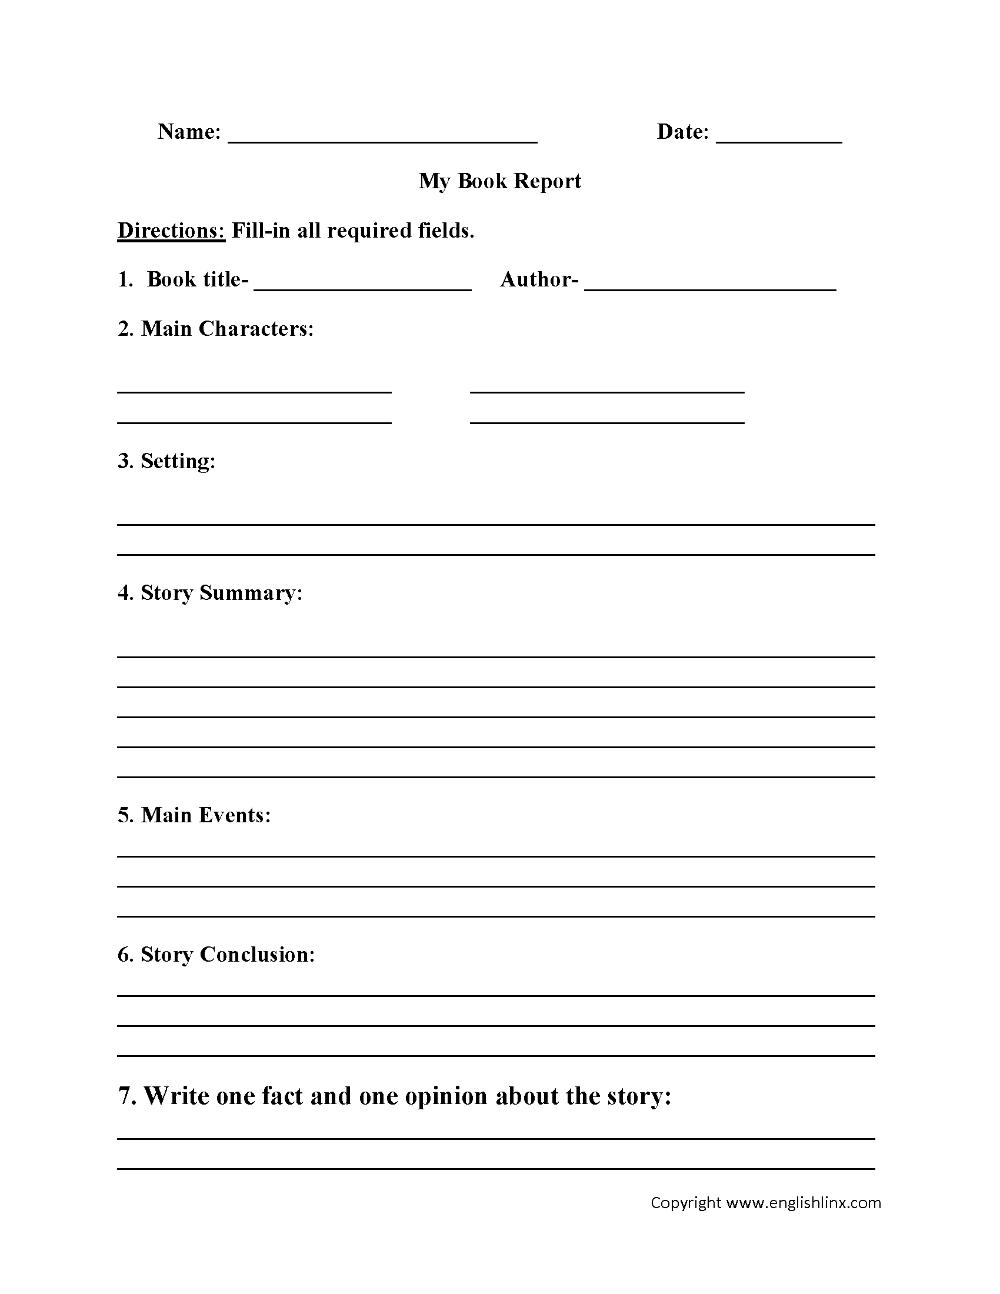 My Book Report Worksheet Englishlinx Board Book Report In 1st Grade Book Report Template 11 Template Ideas 11 Template Ideas [ 1294 x 1000 Pixel ]